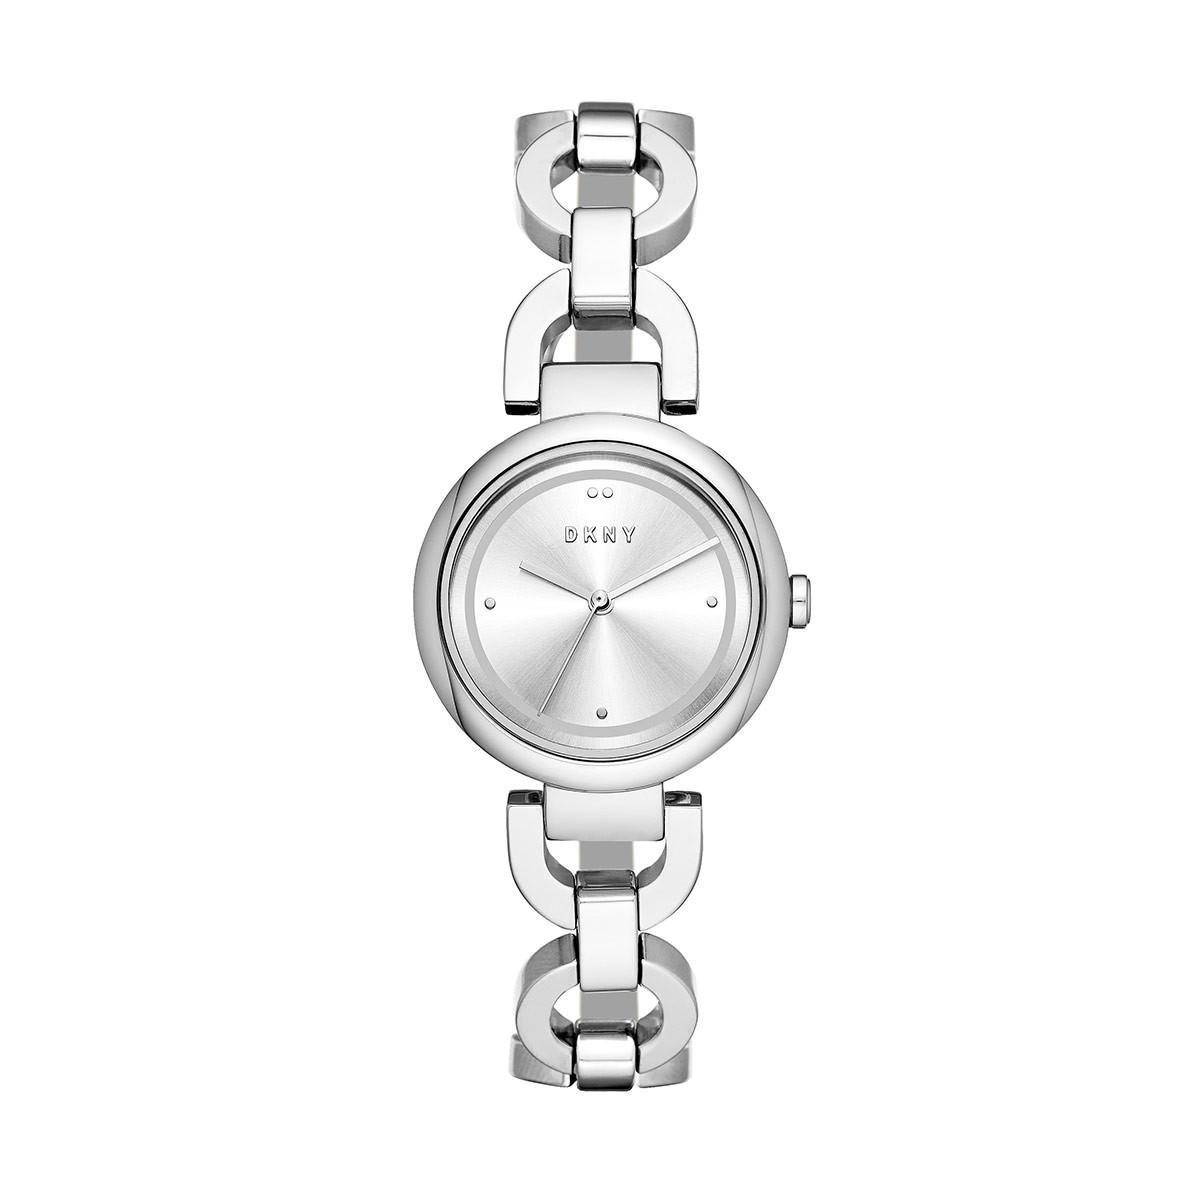 DKNY Uhr - NY2767 Eastside Watch Silver - in silber - für Damen